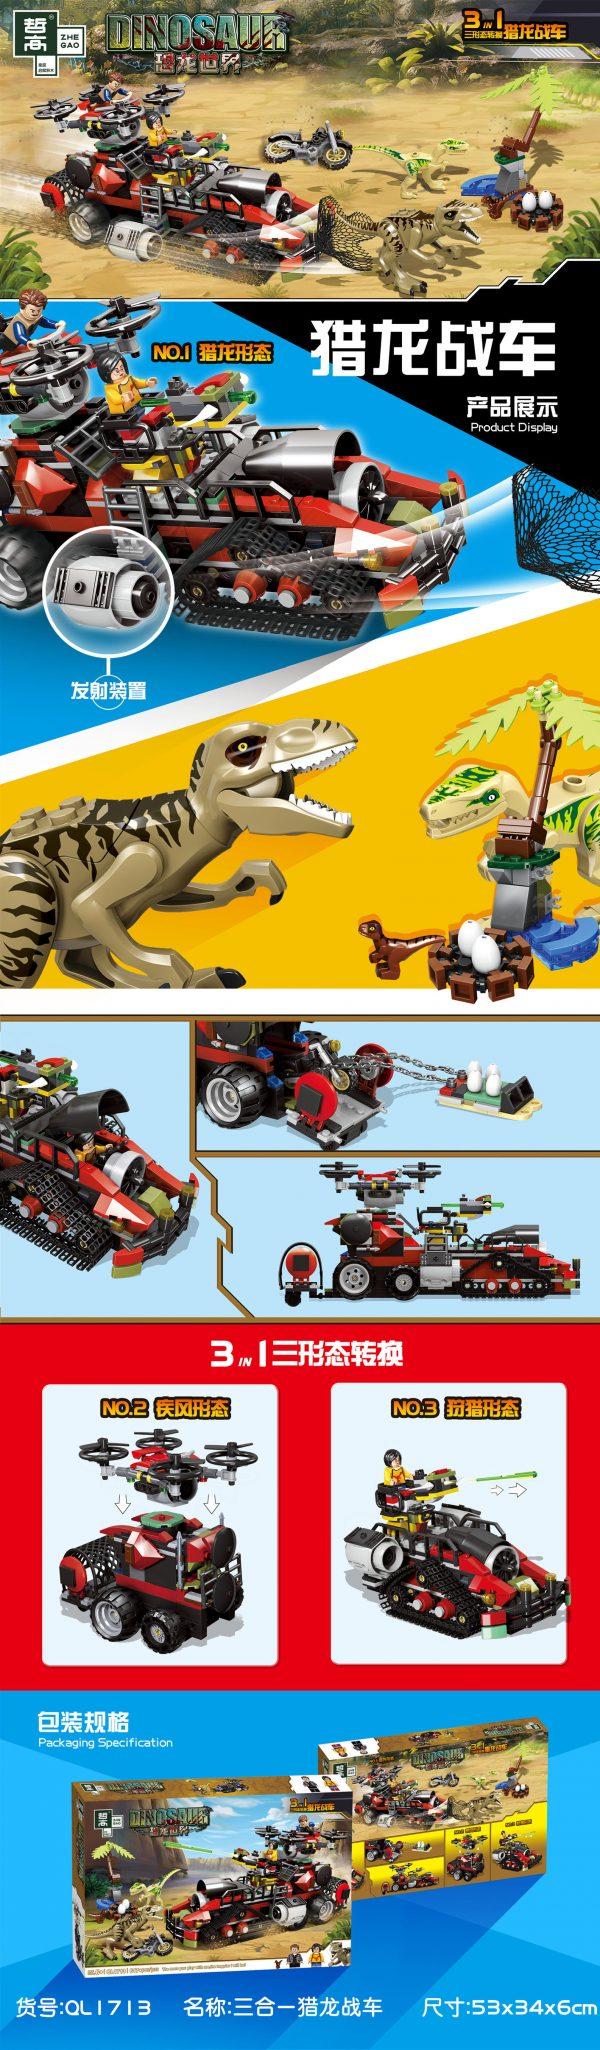 ZHEGAO QL1713 Dinosaur World: Three-in-One Dragon Chariot 0